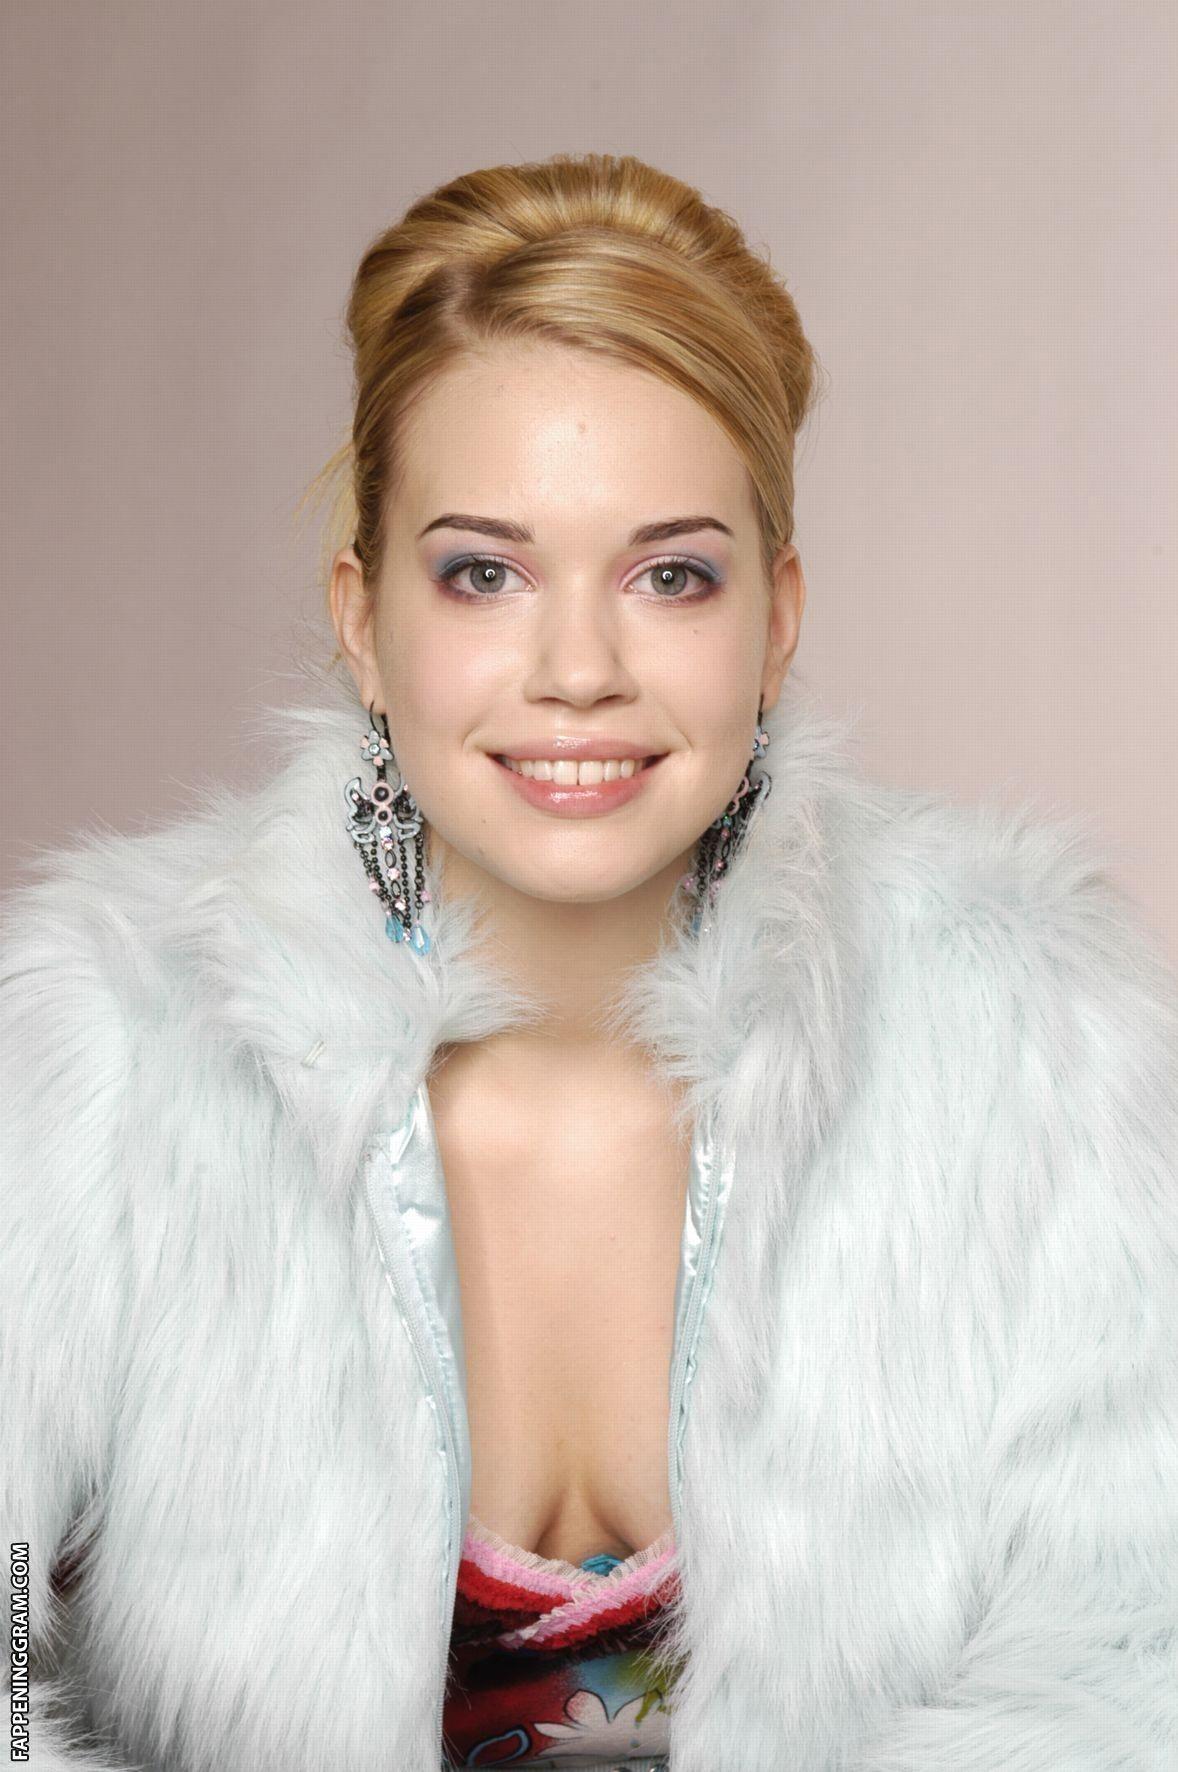 Lara-Isabelle Rentinck Nude The Fappening - FappeningGram